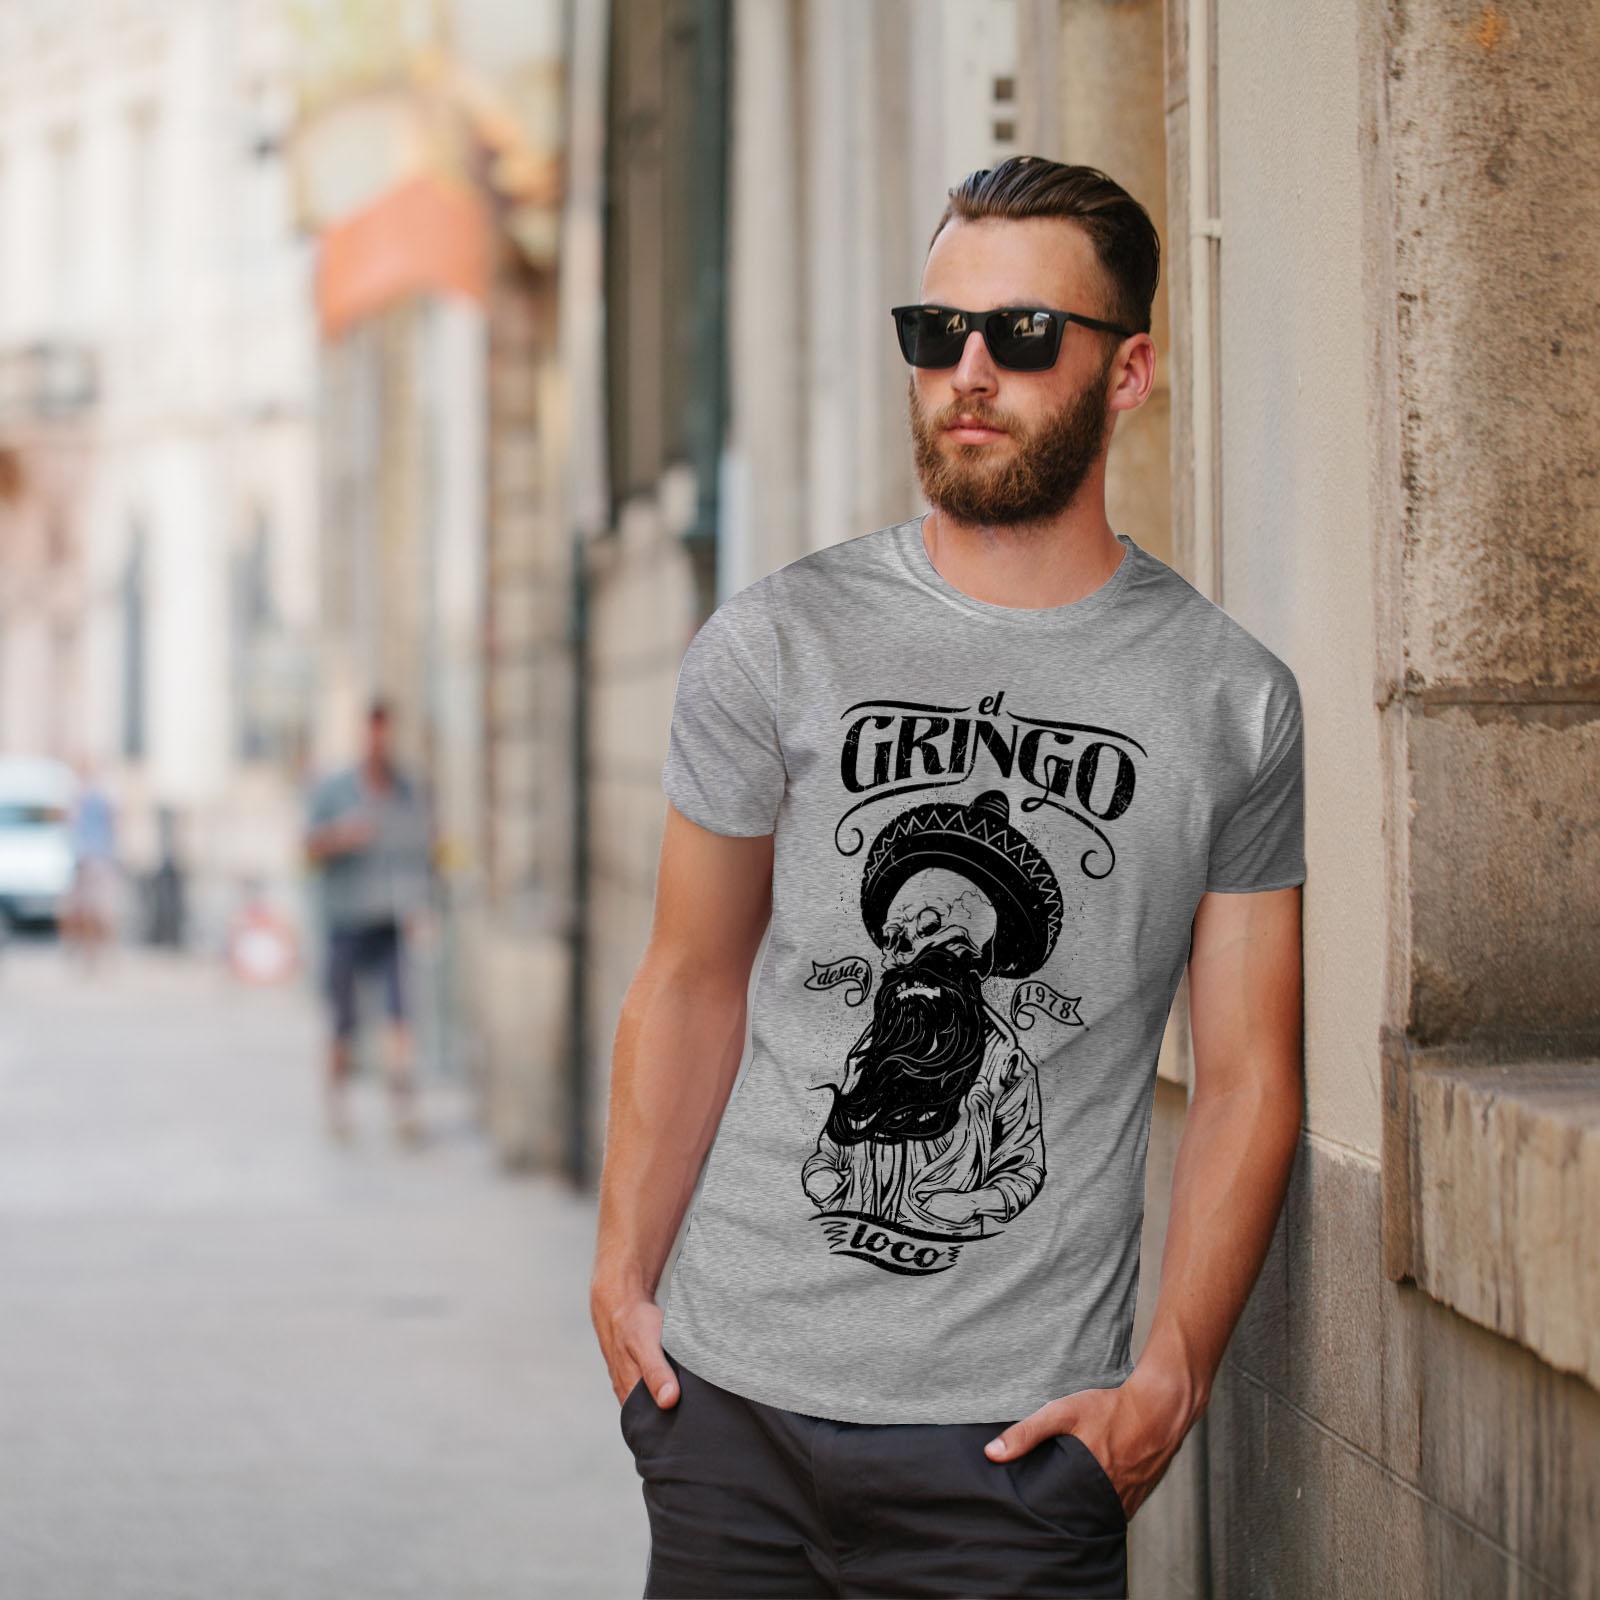 Wellcoda-Gringo-Beard-Skull-Mens-T-shirt-Mexico-Graphic-Design-Printed-Tee thumbnail 17